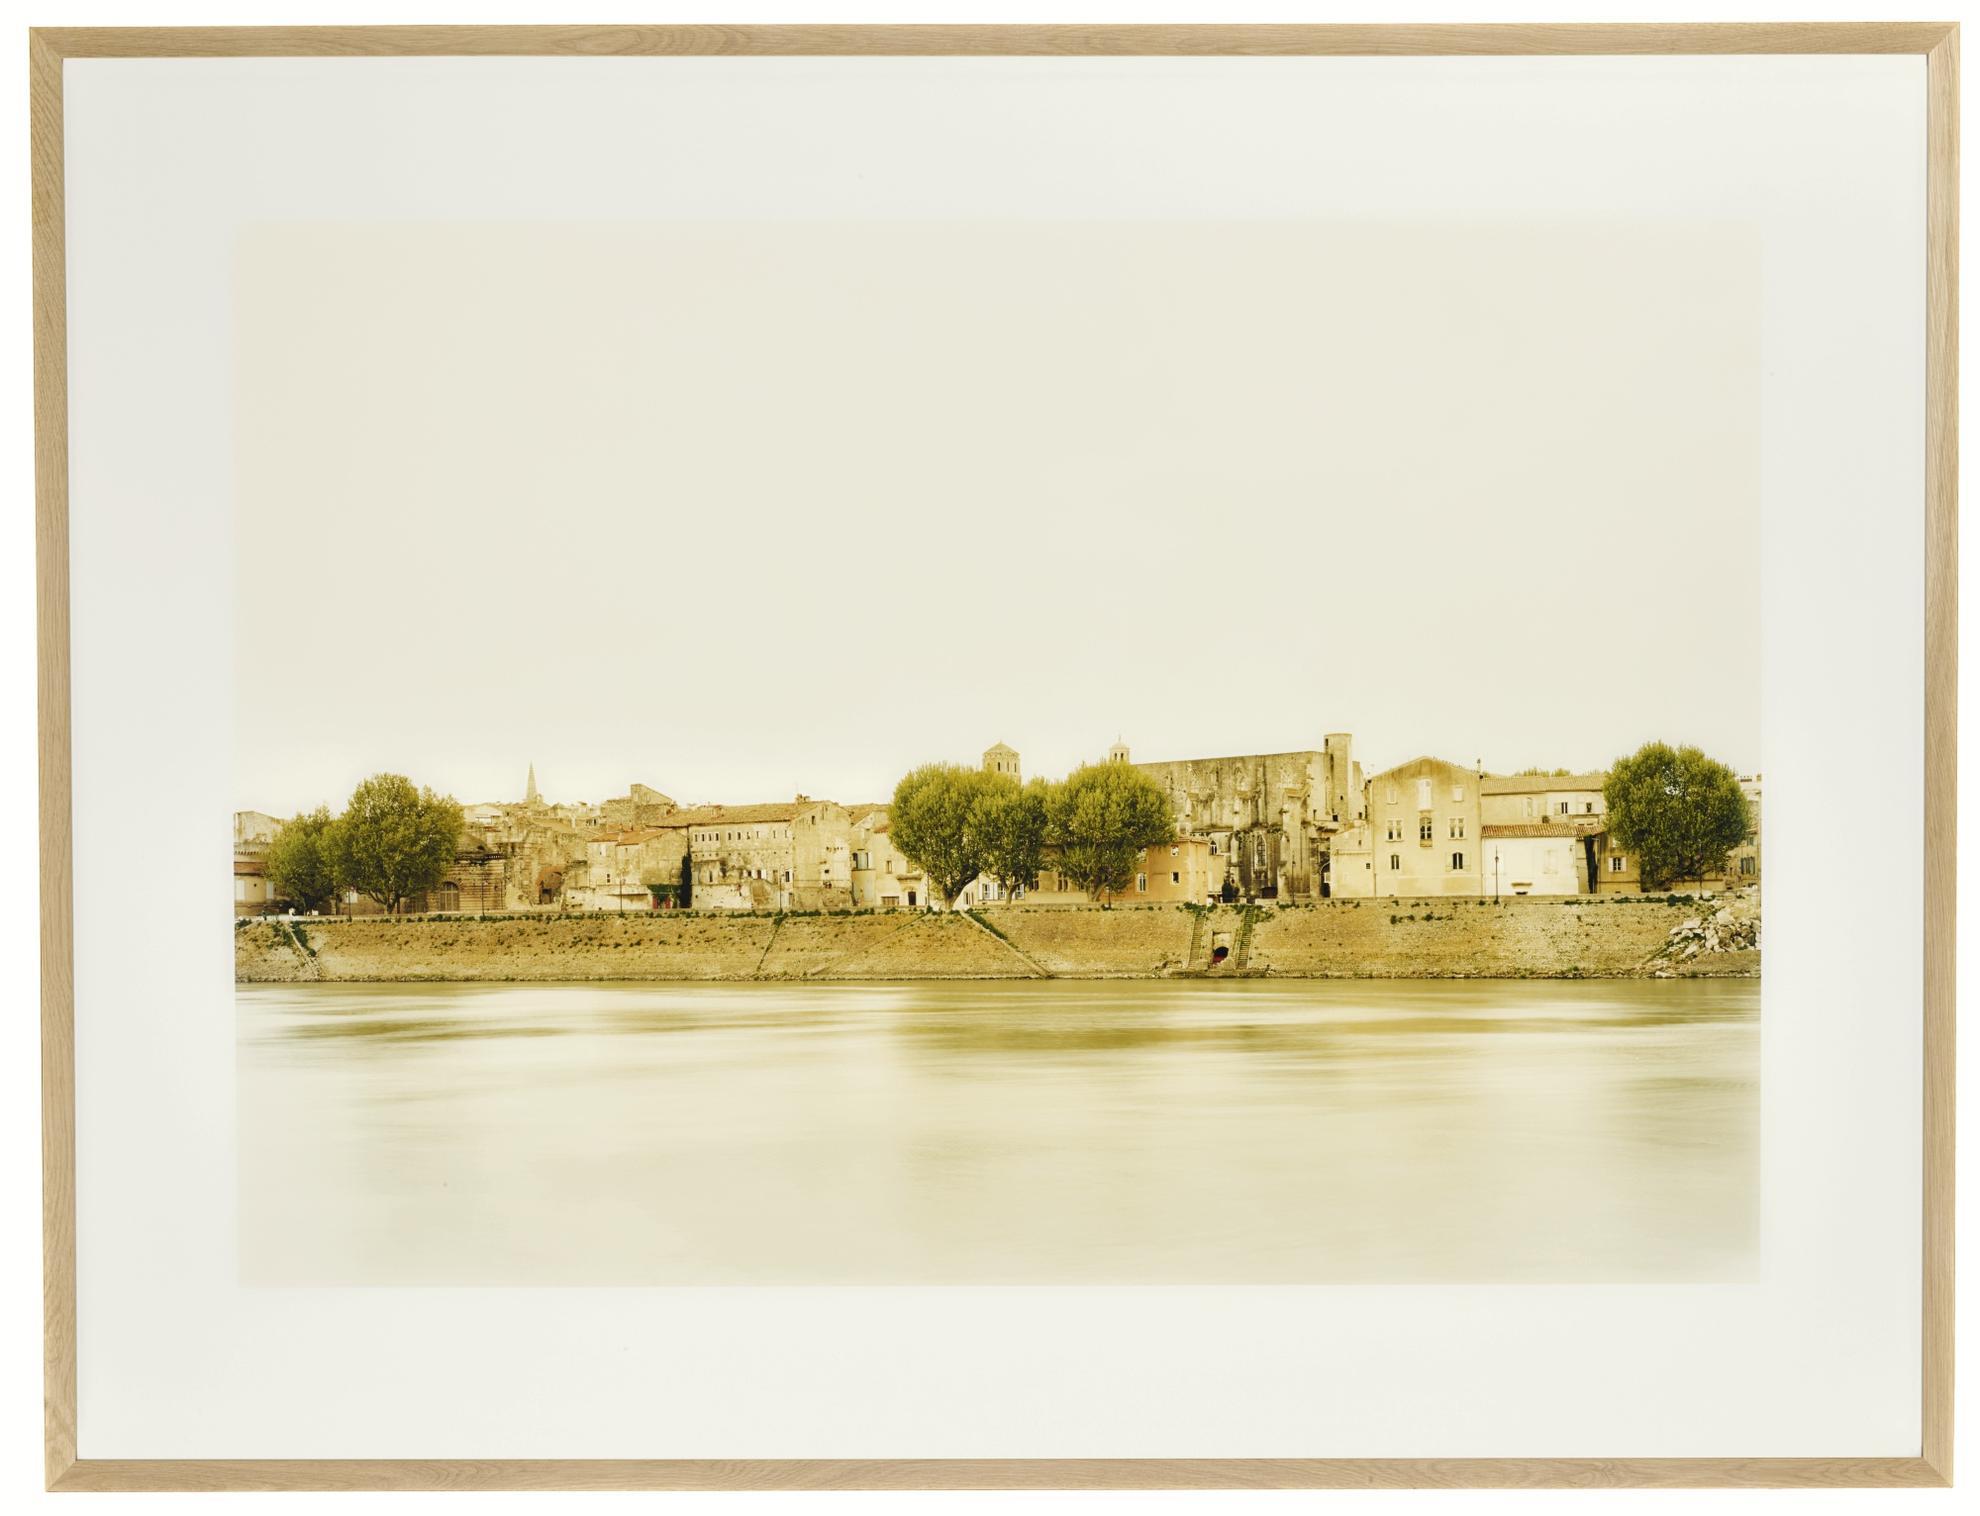 Elger Esser-Arles II, Frankreich-2008